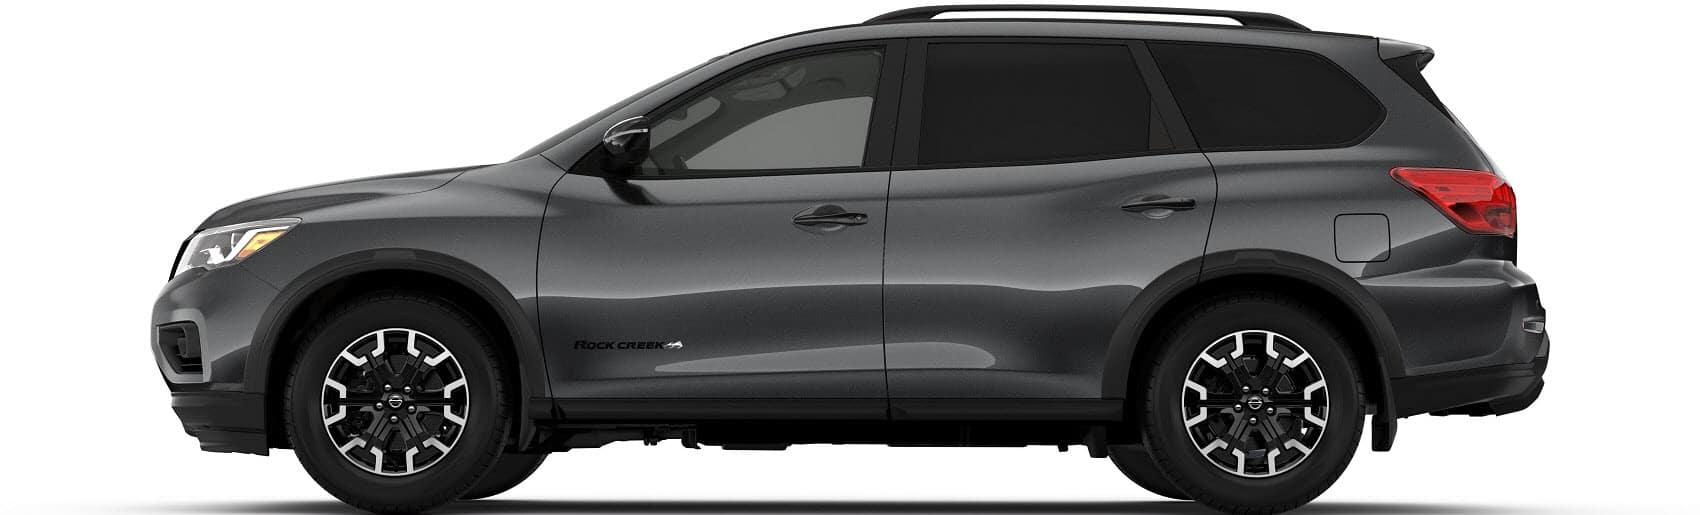 2019 Nissan Pathfinder Kent County Rhode Island